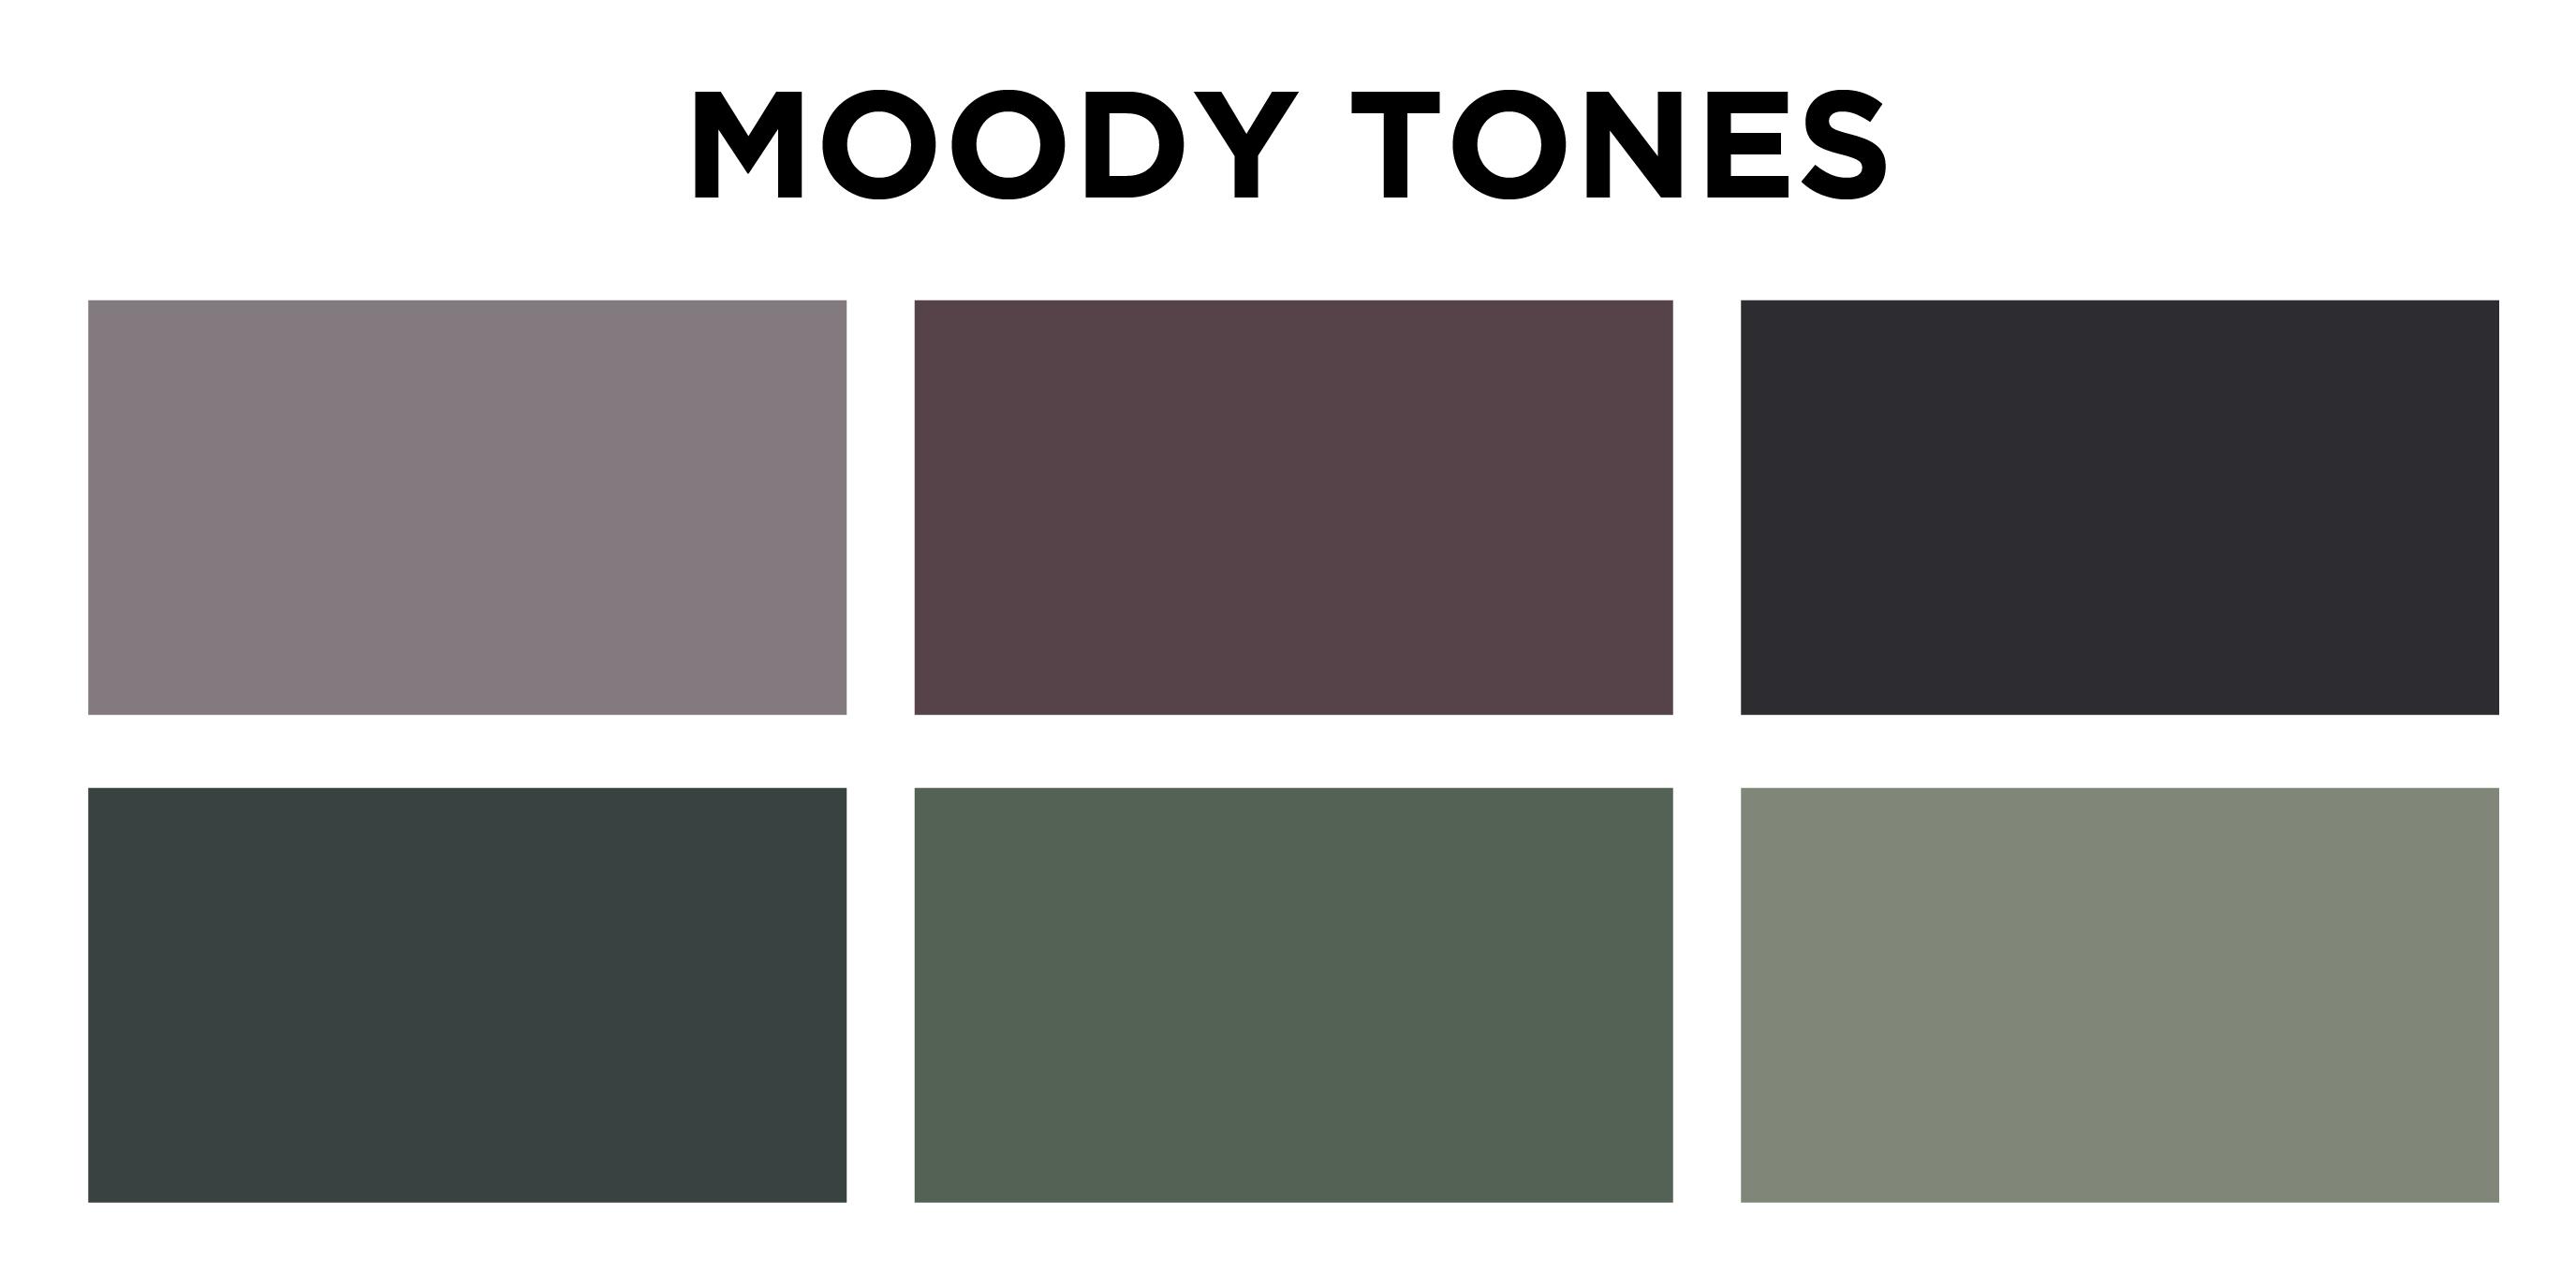 MOODY TONES 01